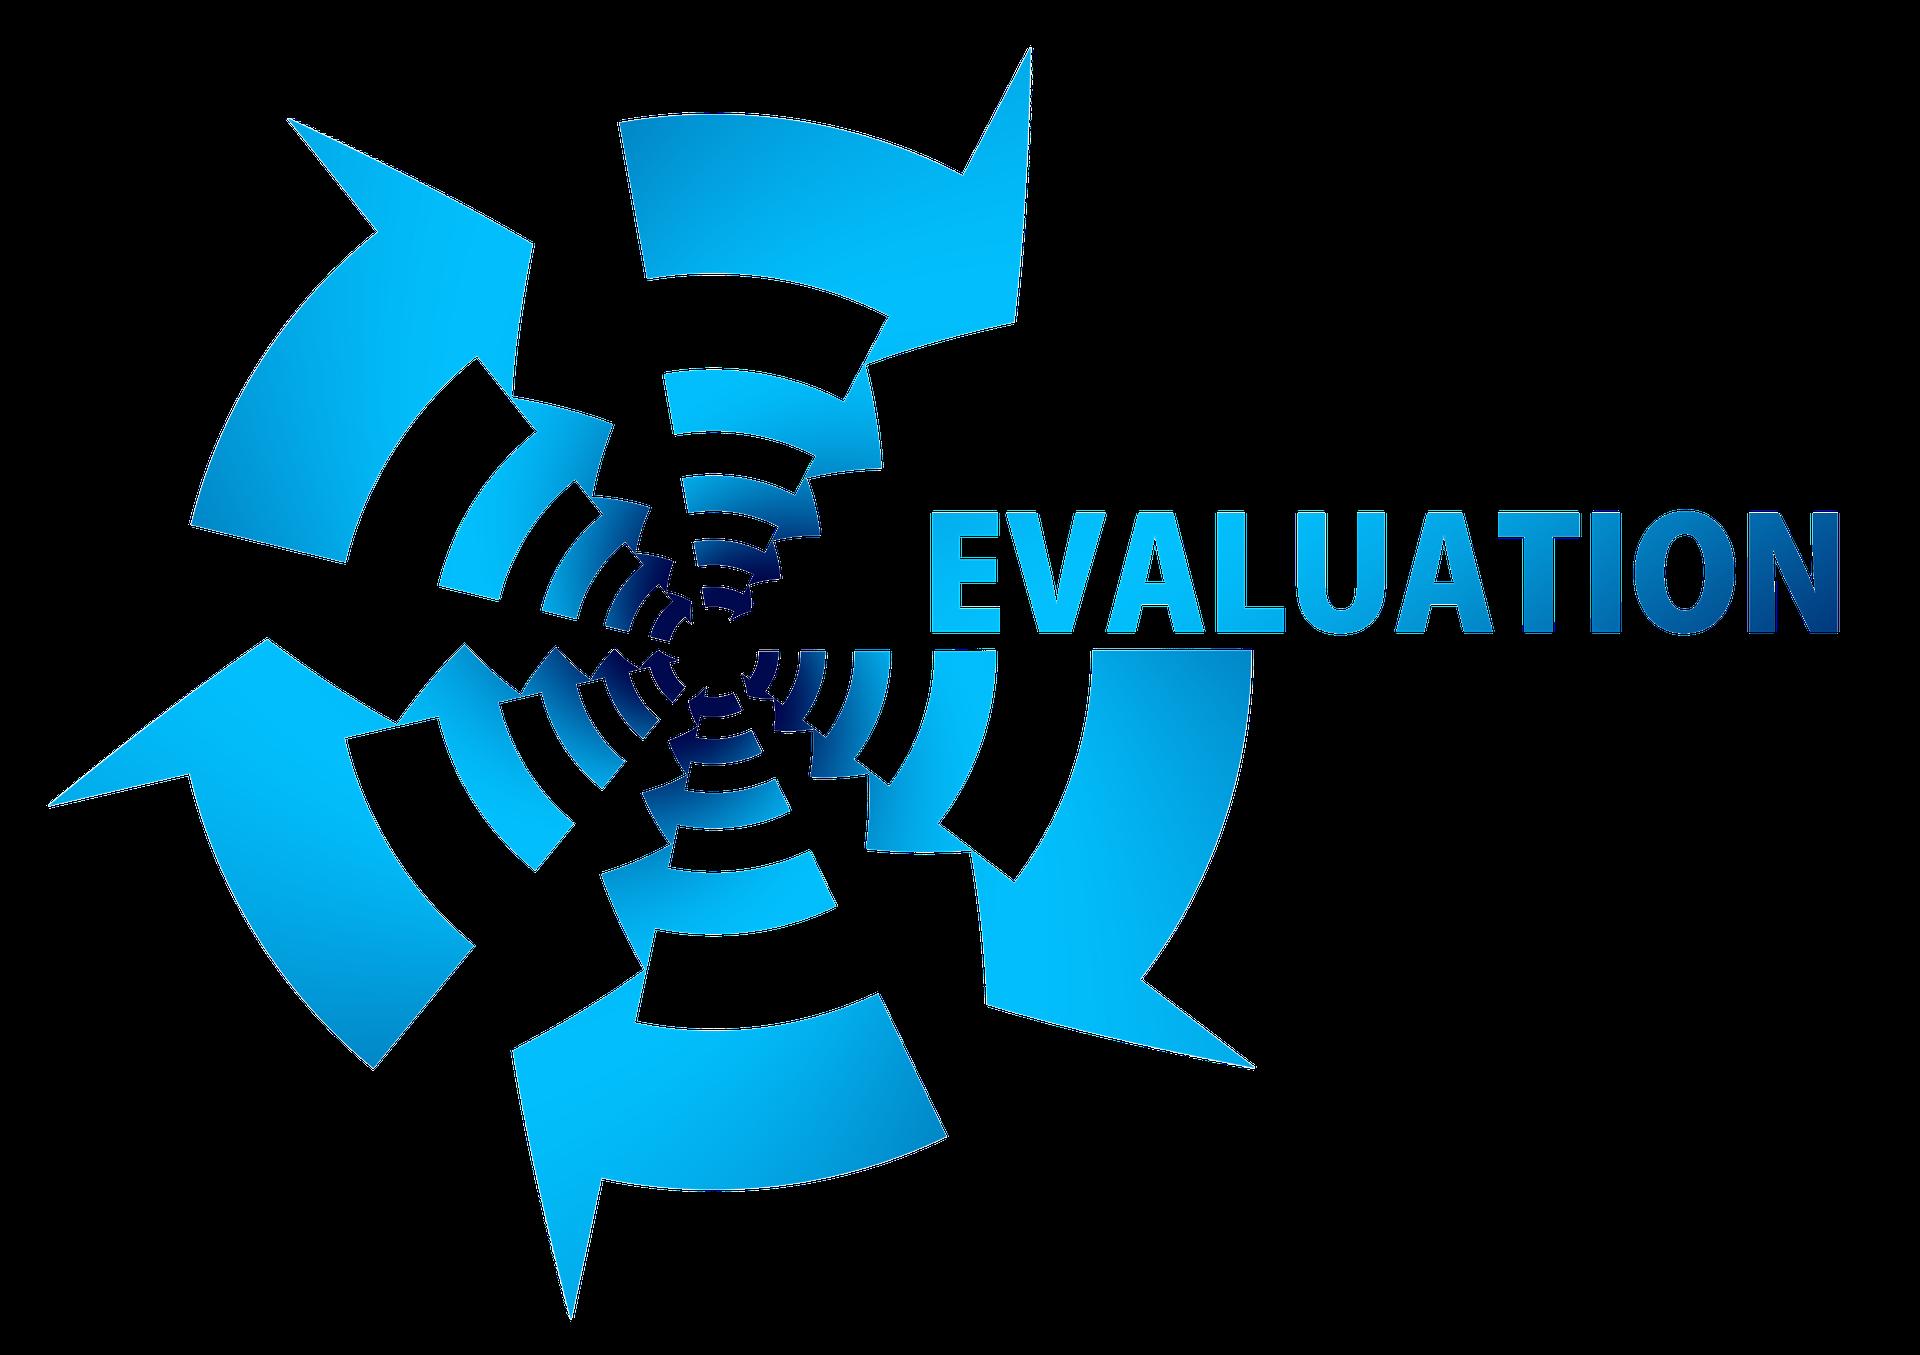 Seminarevaluation – Fluch oder Segen?